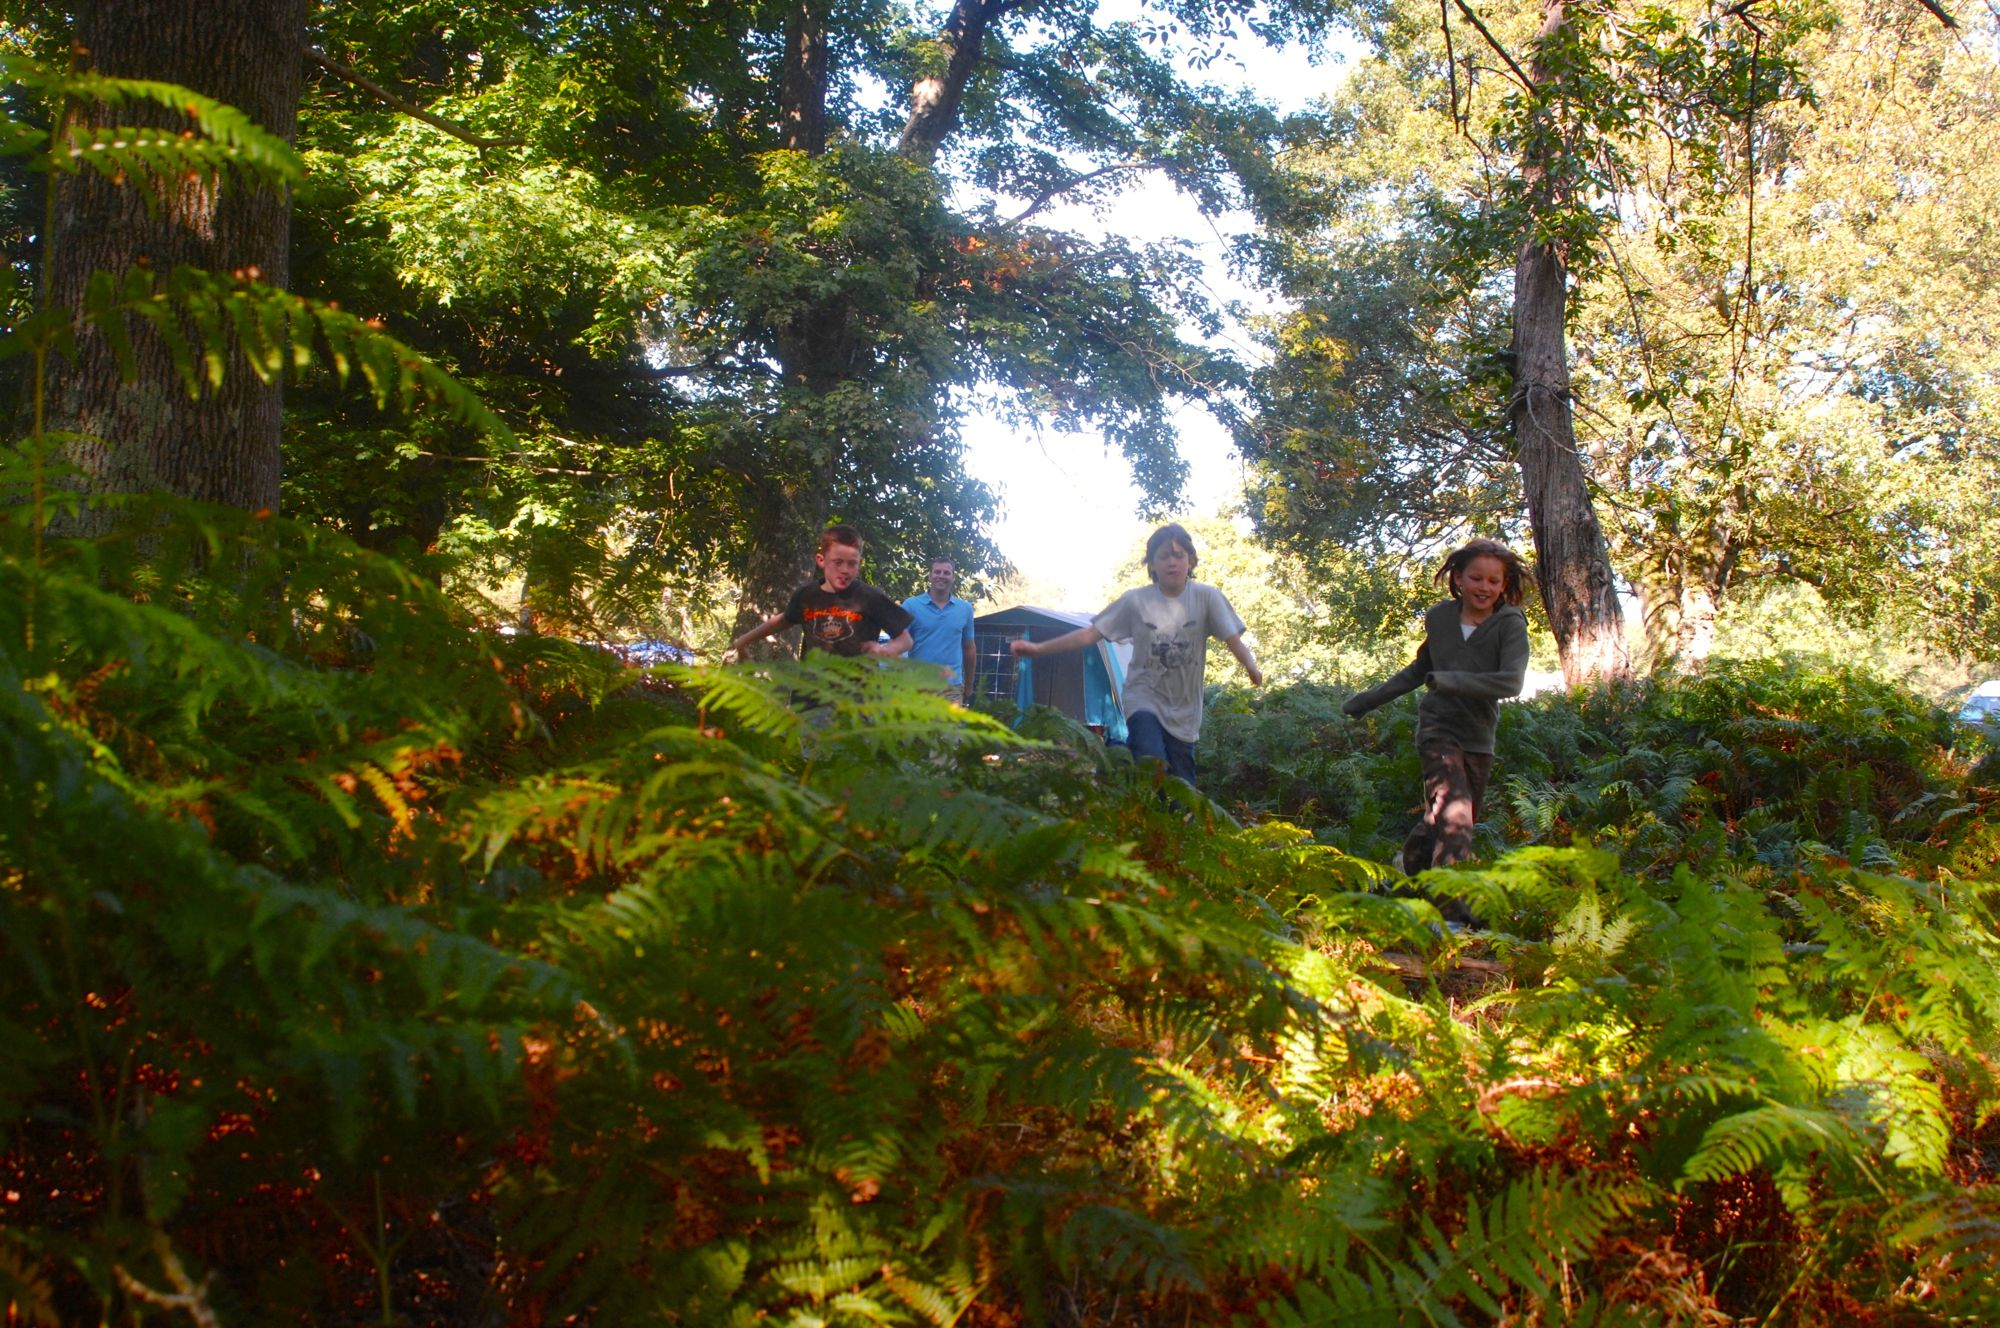 Matley Wood Campsite, Lyndhurst